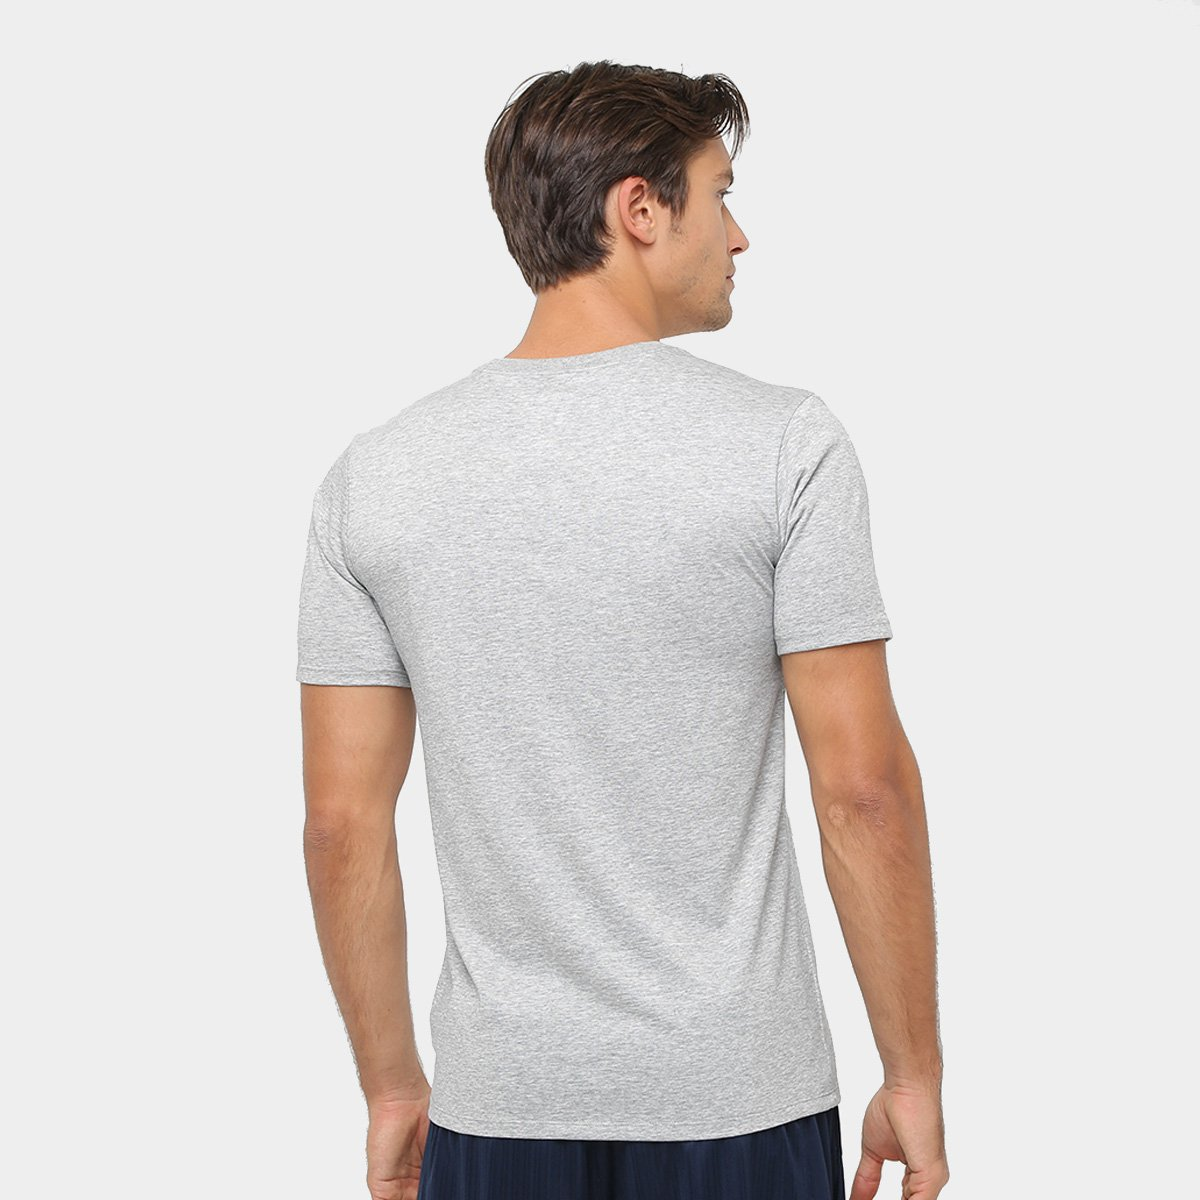 Camiseta Nike Dry Old Glory Masculina - Compre Agora  121f3239f63